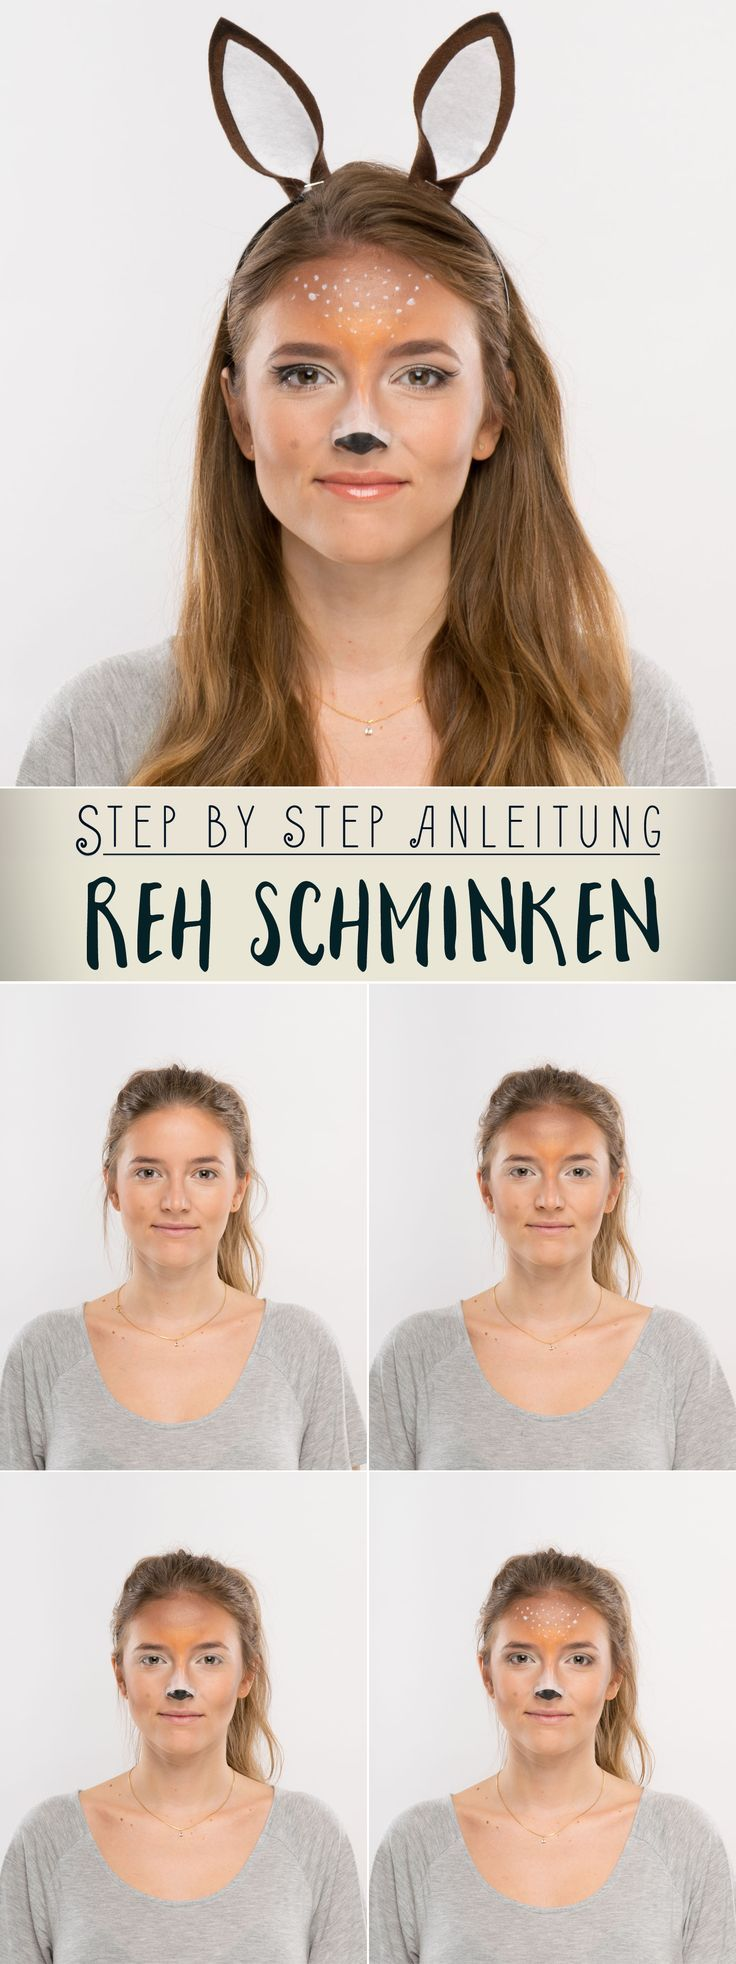 reh schminken step by step karneval fasching pinterest halloween kost m und fasching. Black Bedroom Furniture Sets. Home Design Ideas